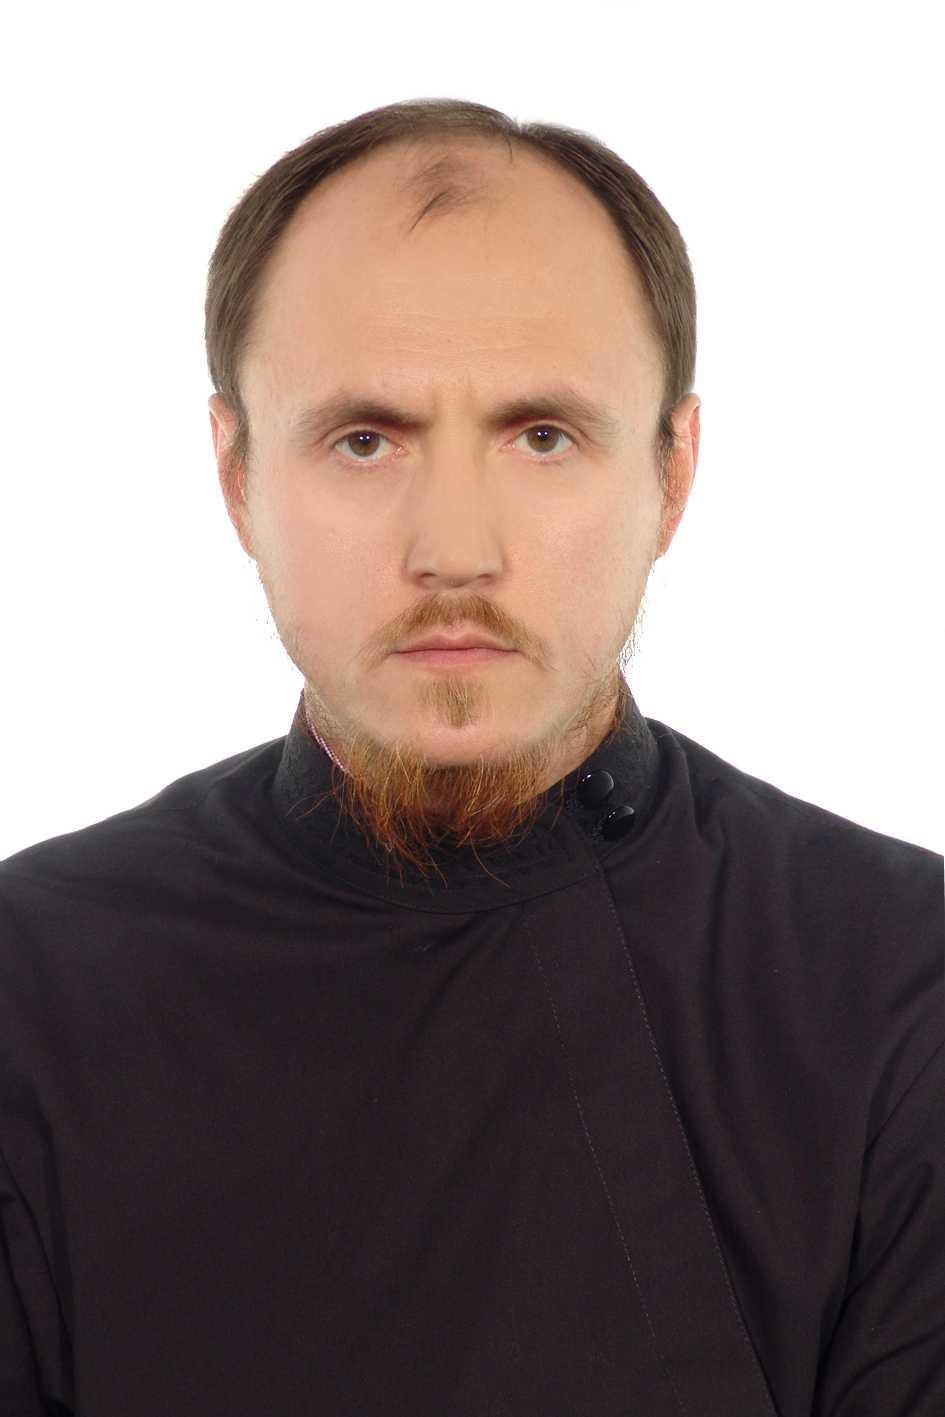 диакон Михаил Леонидович Фадеев